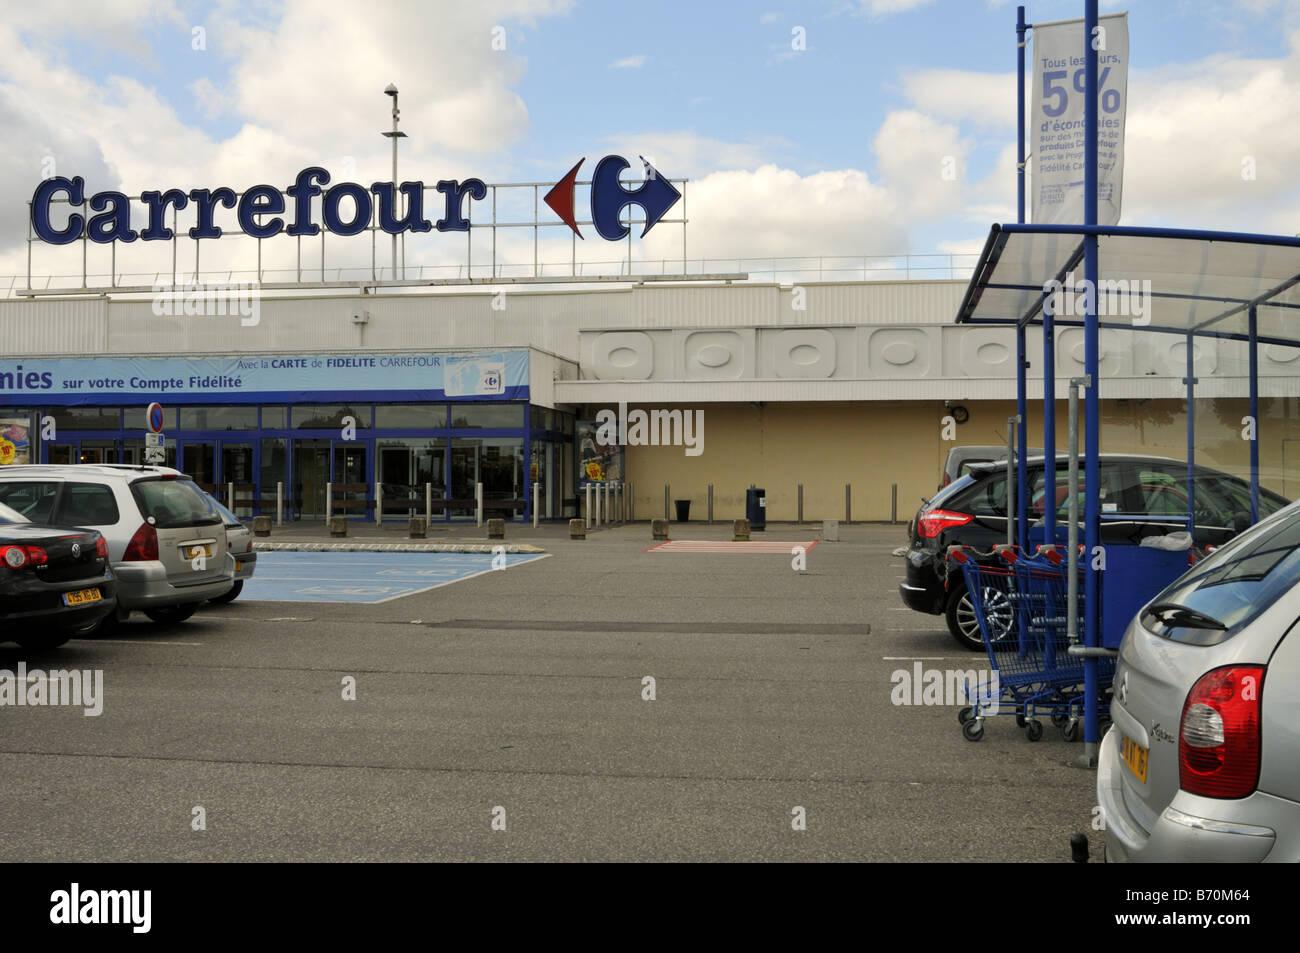 Carte Carrefour Hyper.Carrefour Hypermarket France Stock Photo 21528812 Alamy